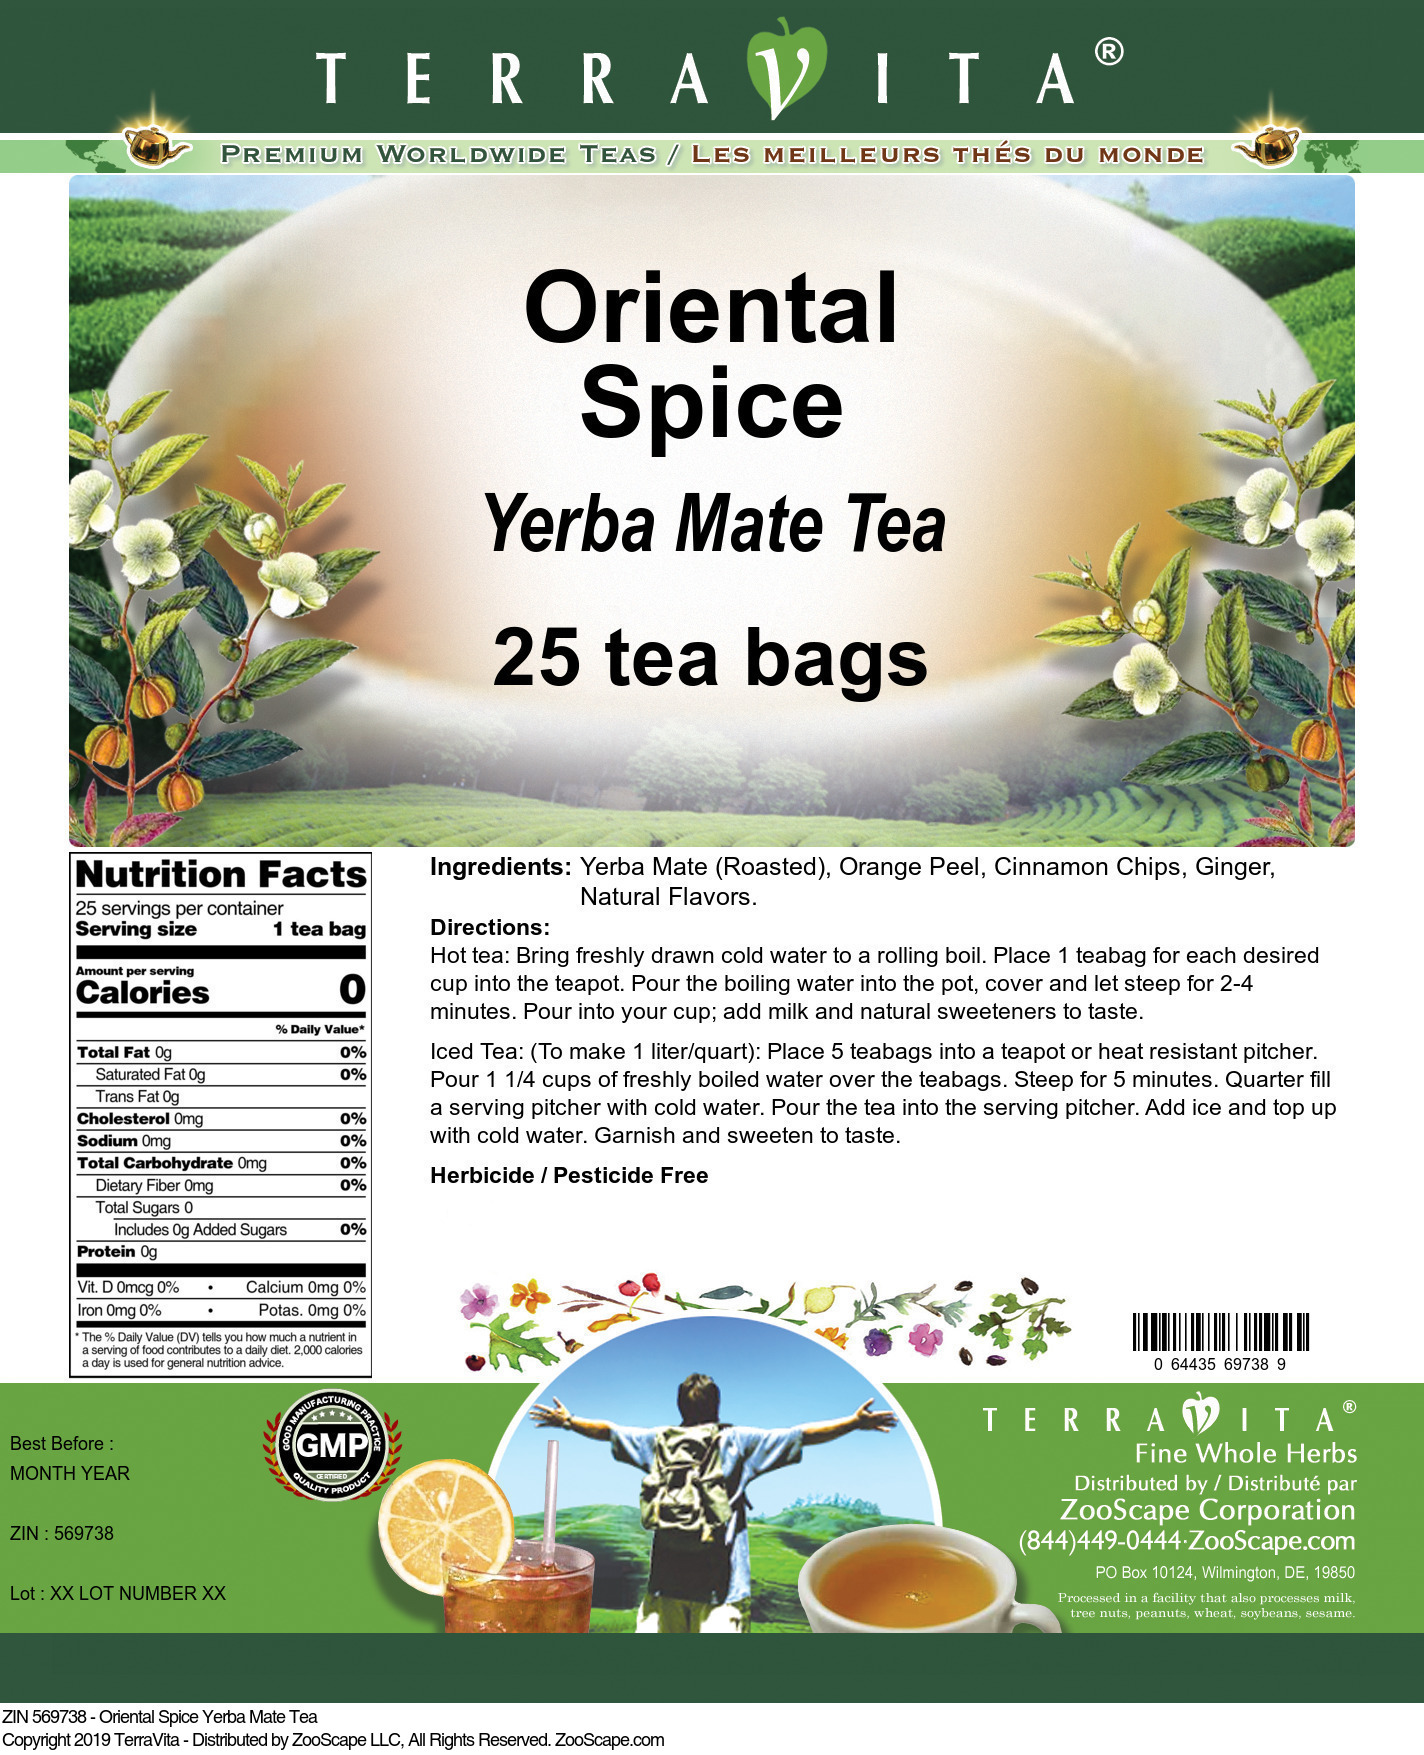 Oriental Spice Yerba Mate Tea